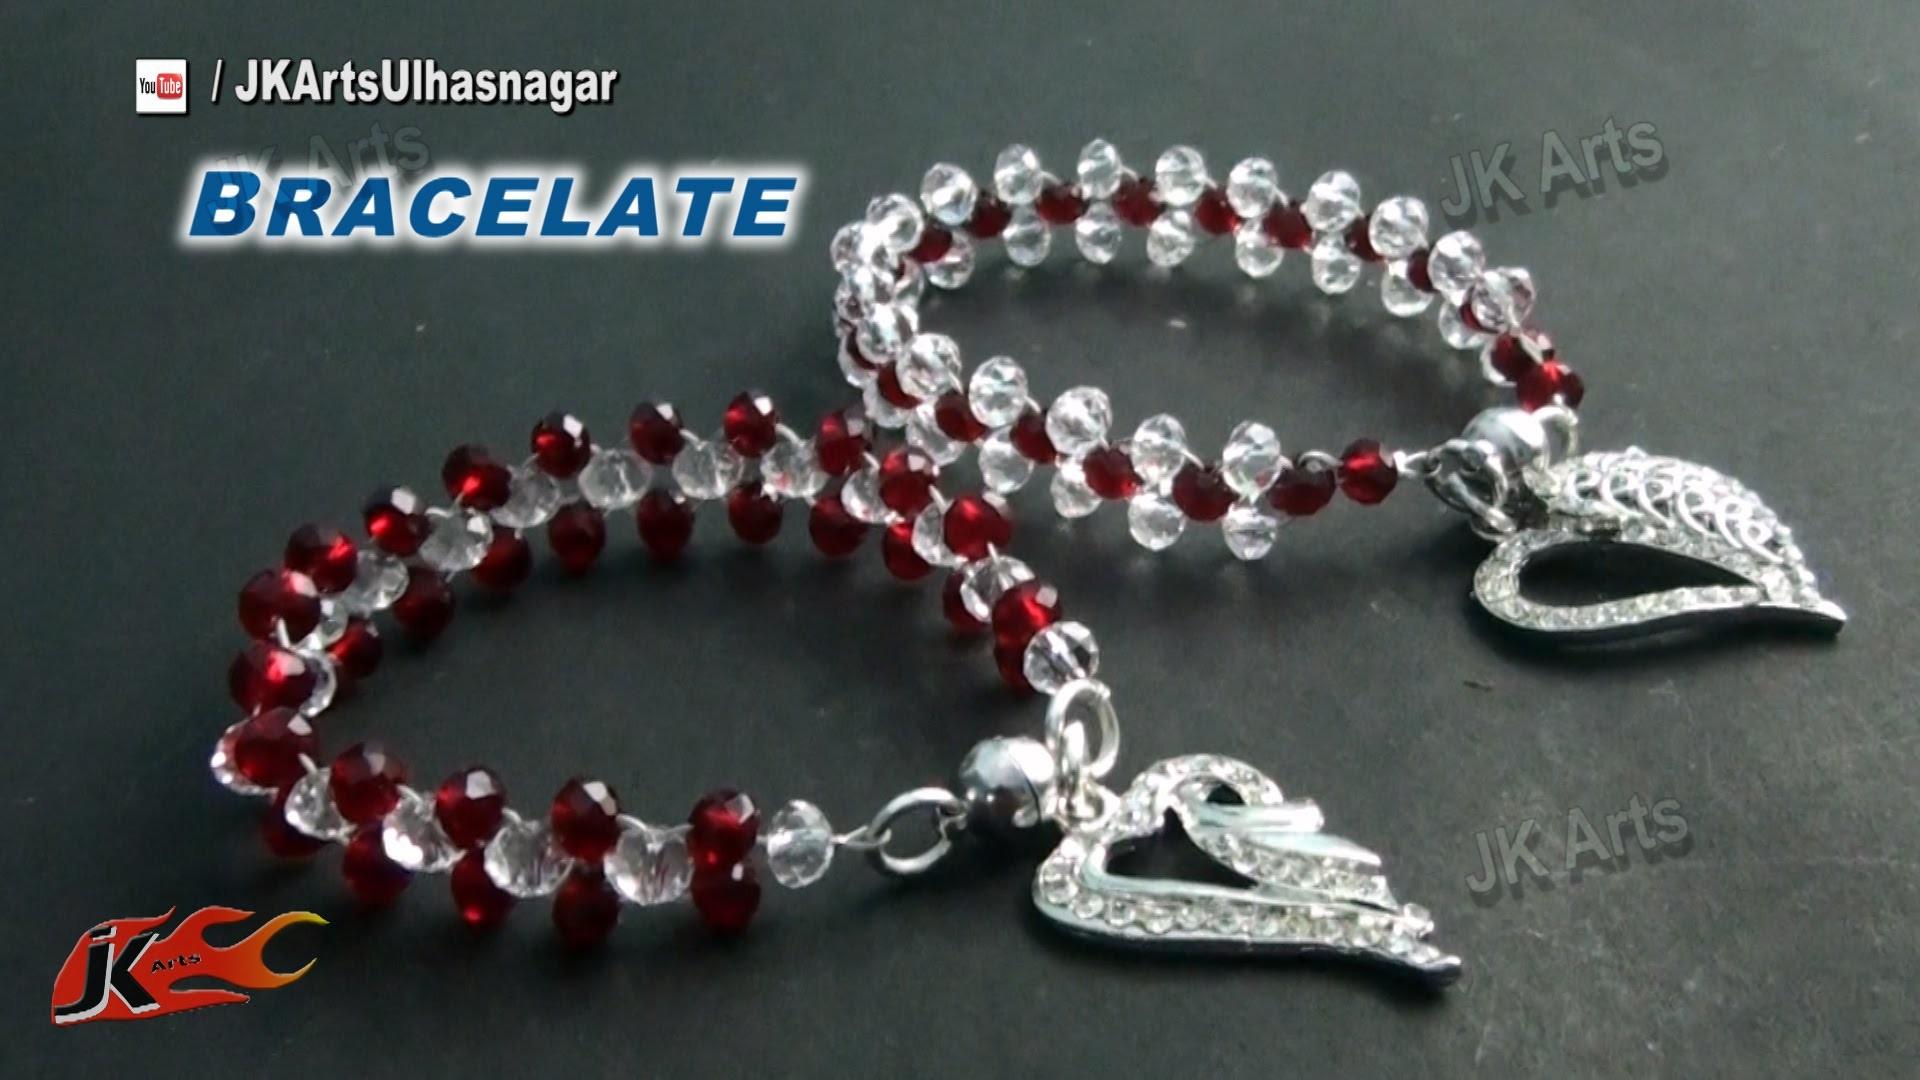 DIY  Crystal Beads Bracelet | Valentine's Day Gift Idea  | How to make | JK Arts 834